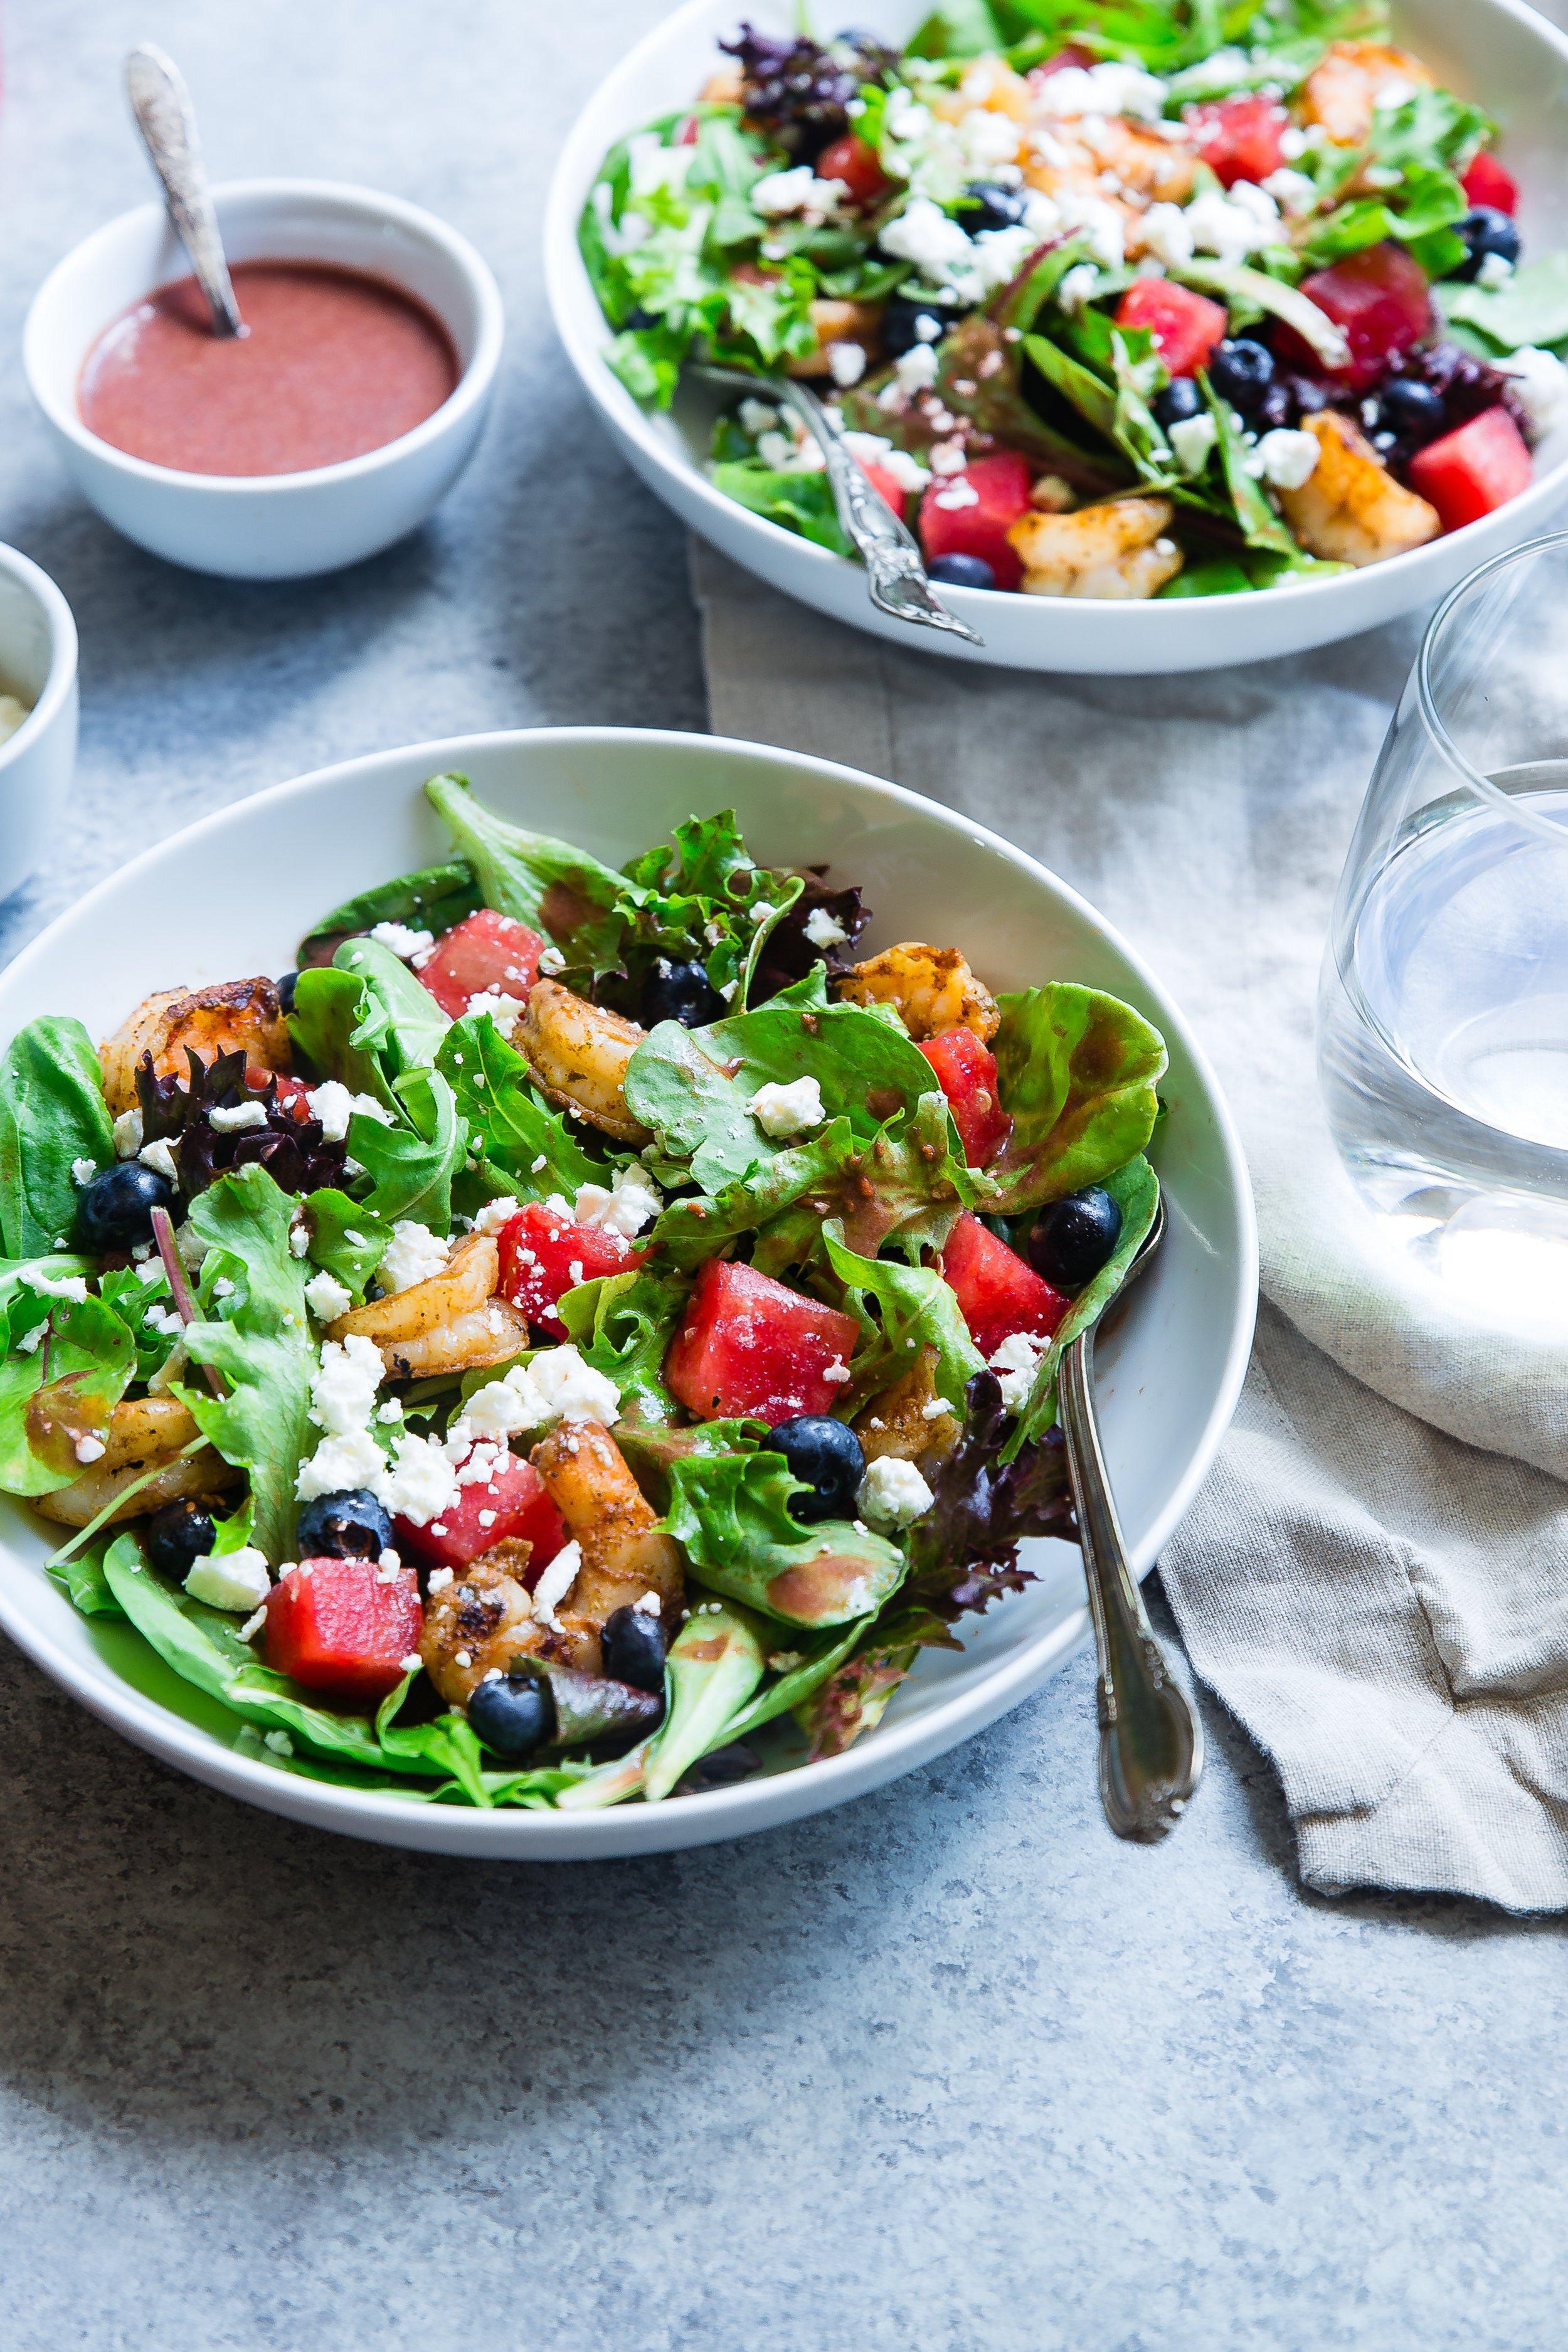 Watermelon Salad - cubed fresh watermelontender greensavocado oilparsleysweet potato thins, cracked